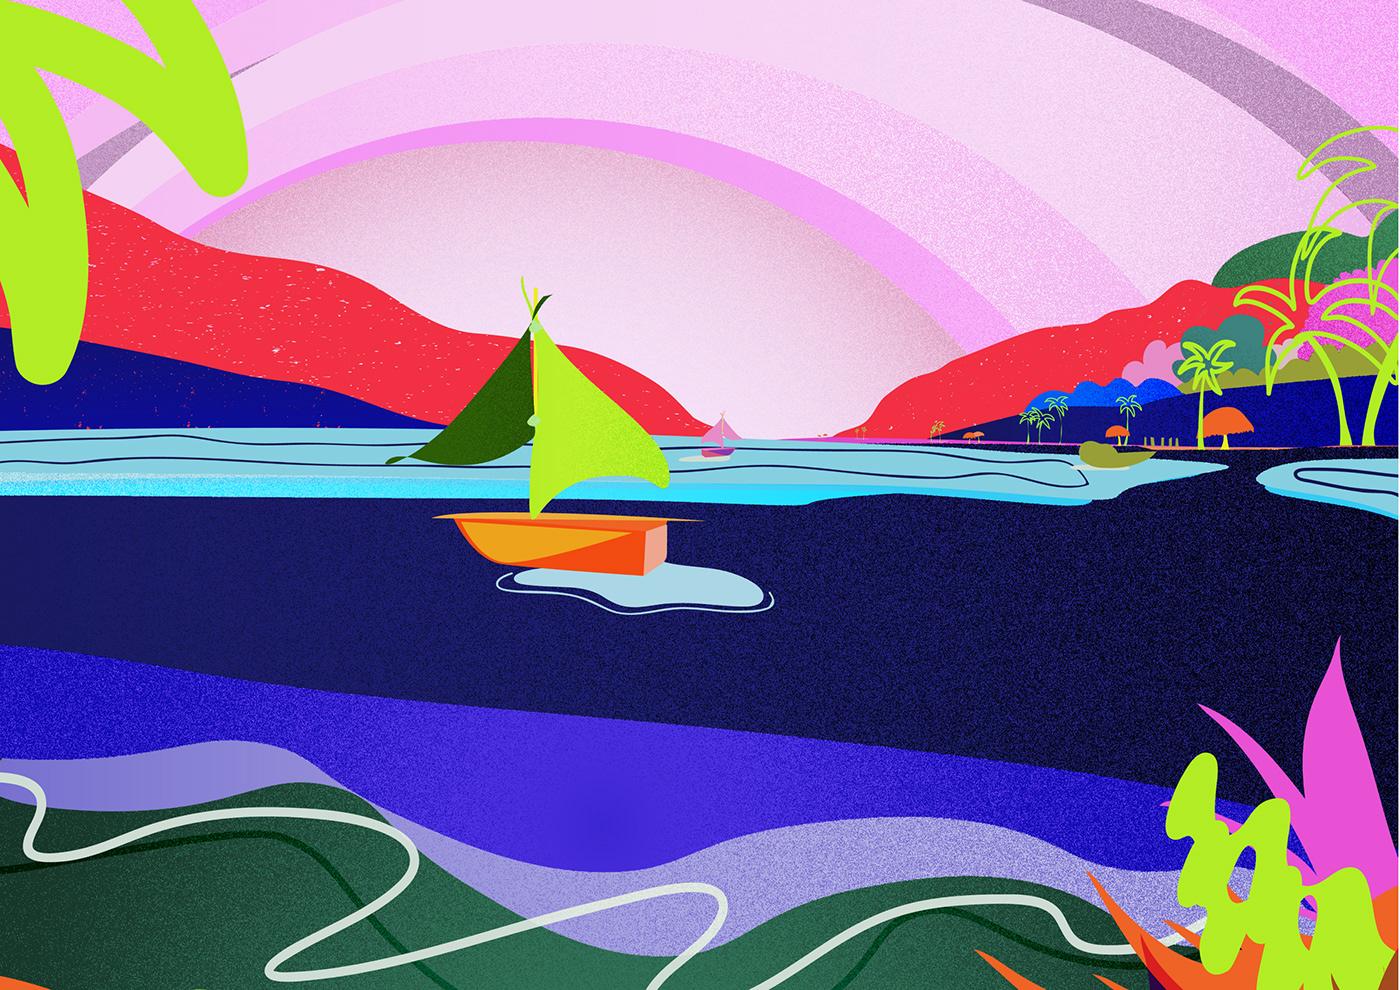 art direction  artwork creative Digital Art  Drawing  graphic design  ILLUSTRATION  illustration art Procreate vector